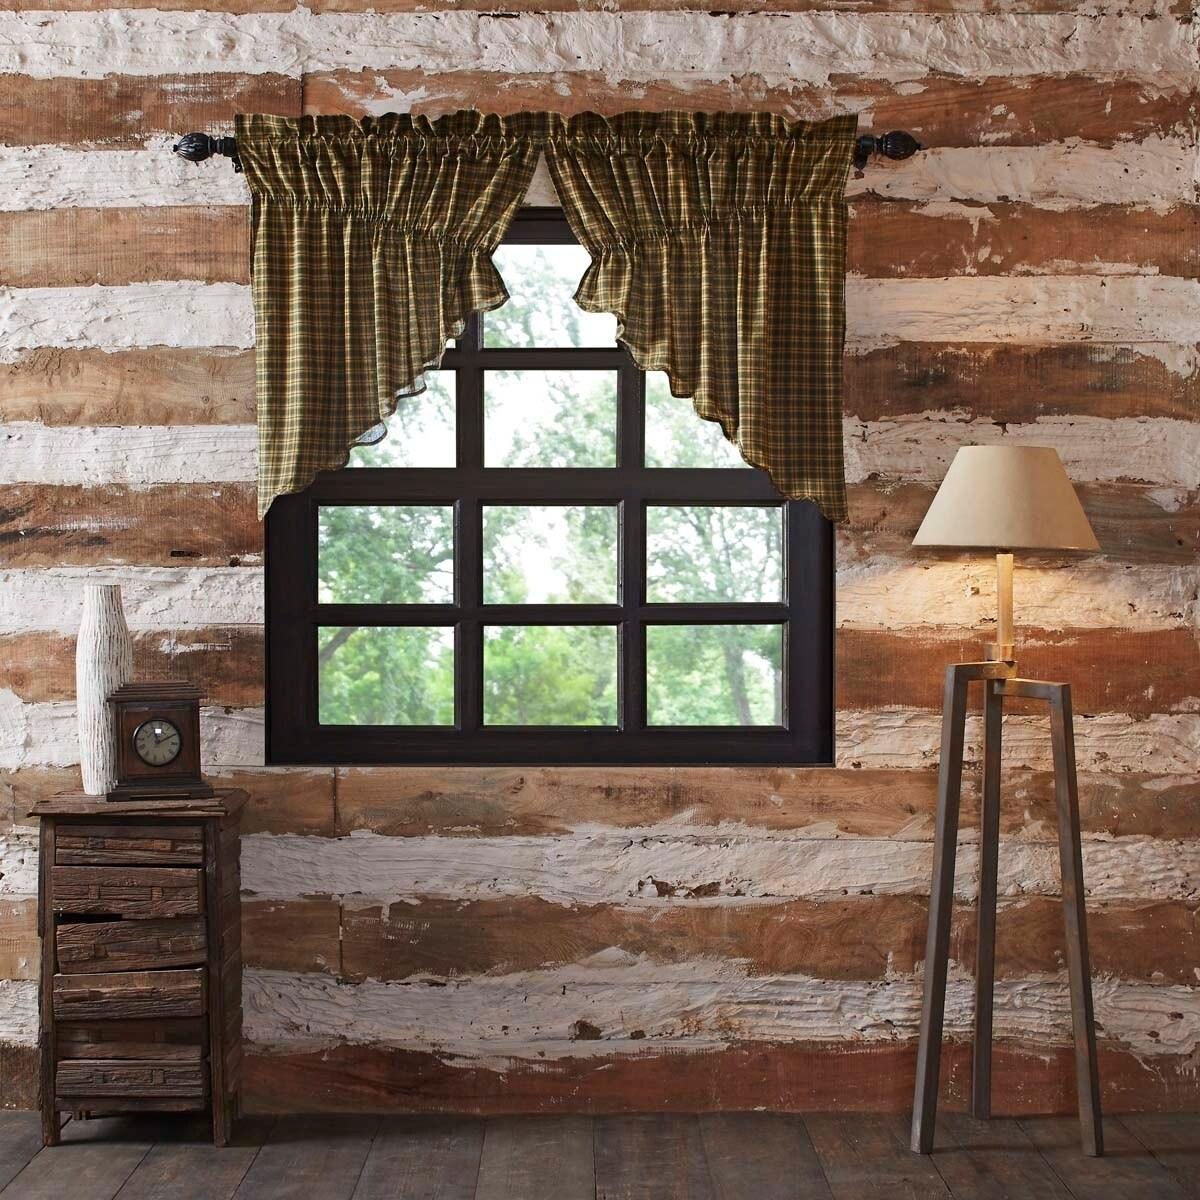 Details about Green Rustic Kitchen Curtains VHC Barrington Prairie Swag  Deep Green, Natural, D